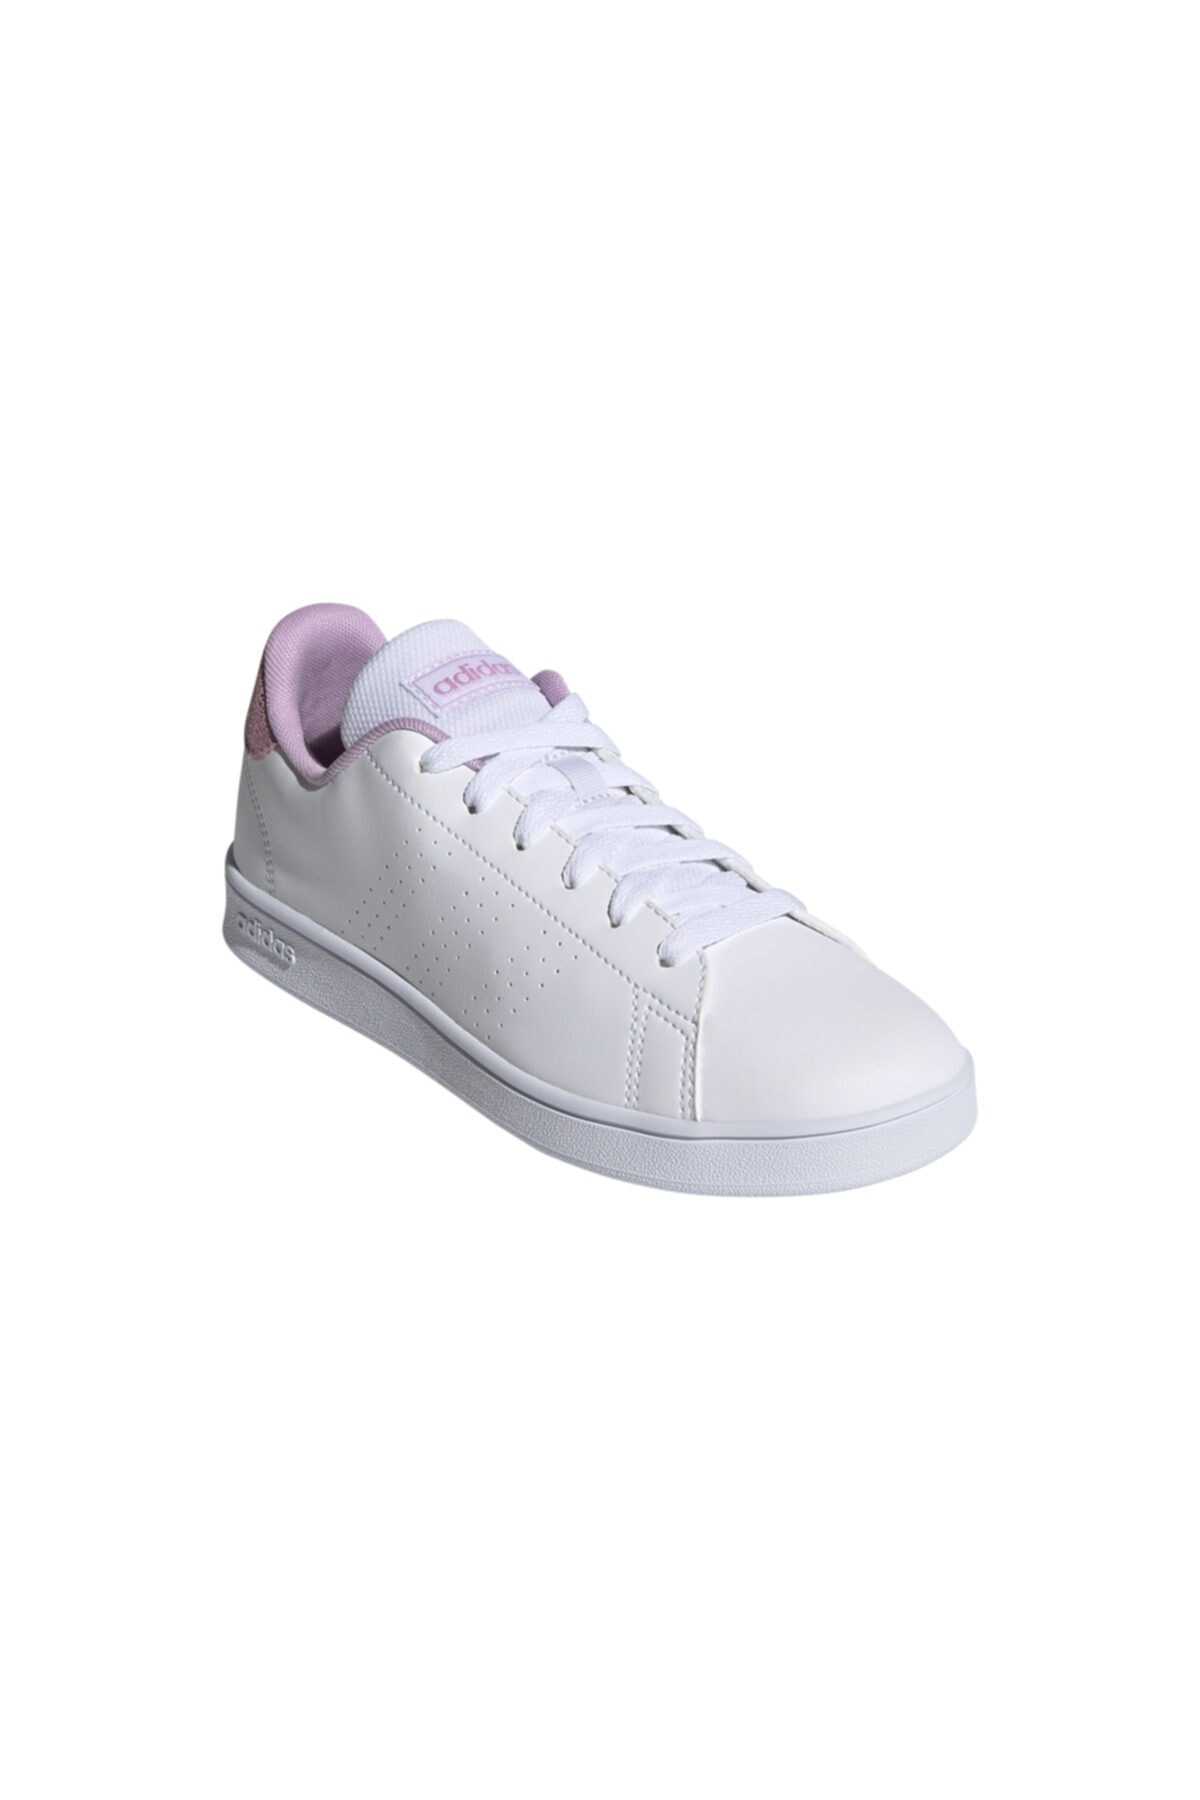 adidas Advantage (gs) Spor Ayakkabı 2